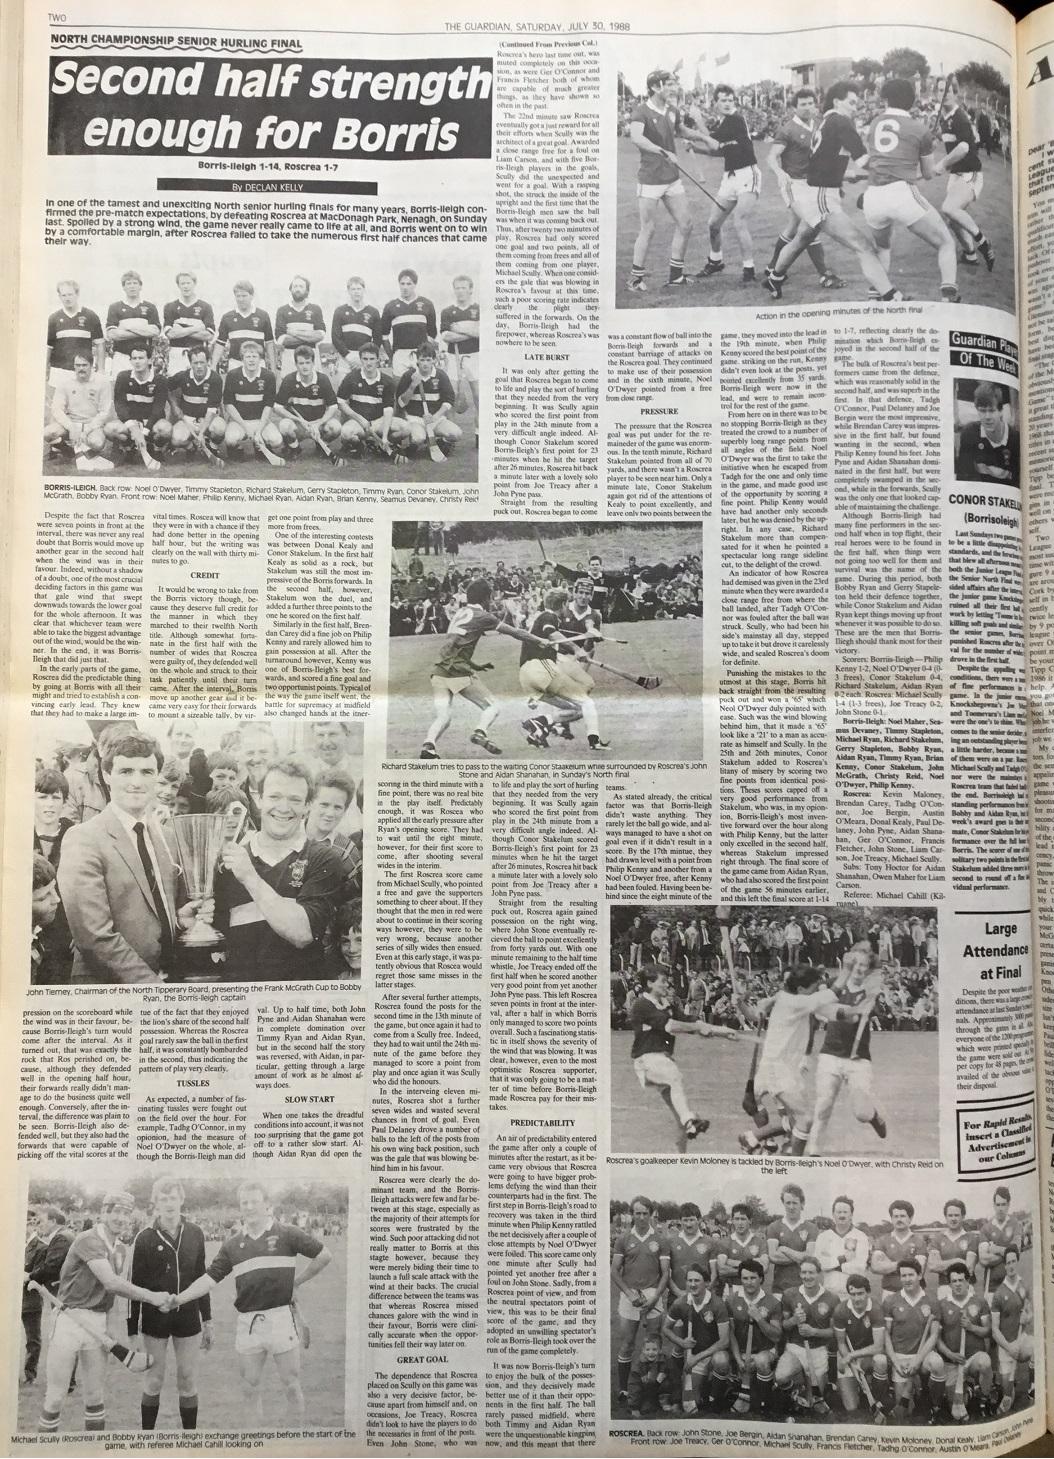 1988 North hurling final